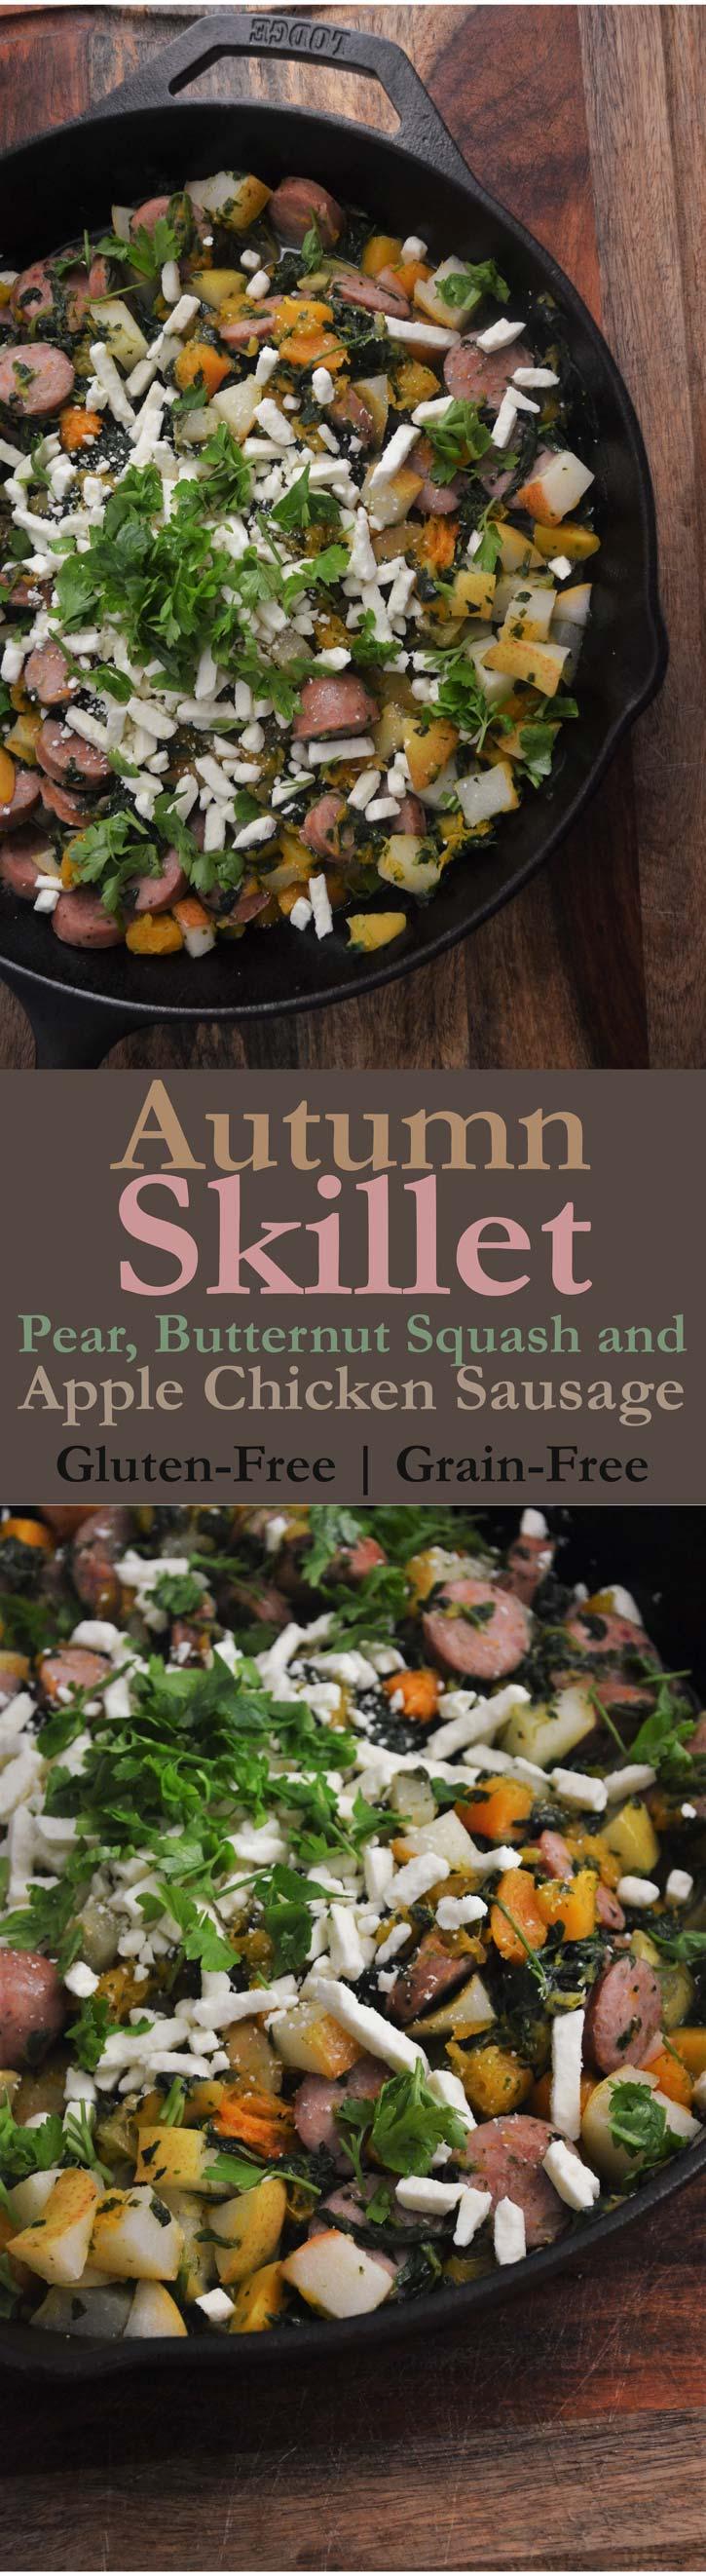 autumn chicken sausage feta butternut squash spinach pear gluten free grain free